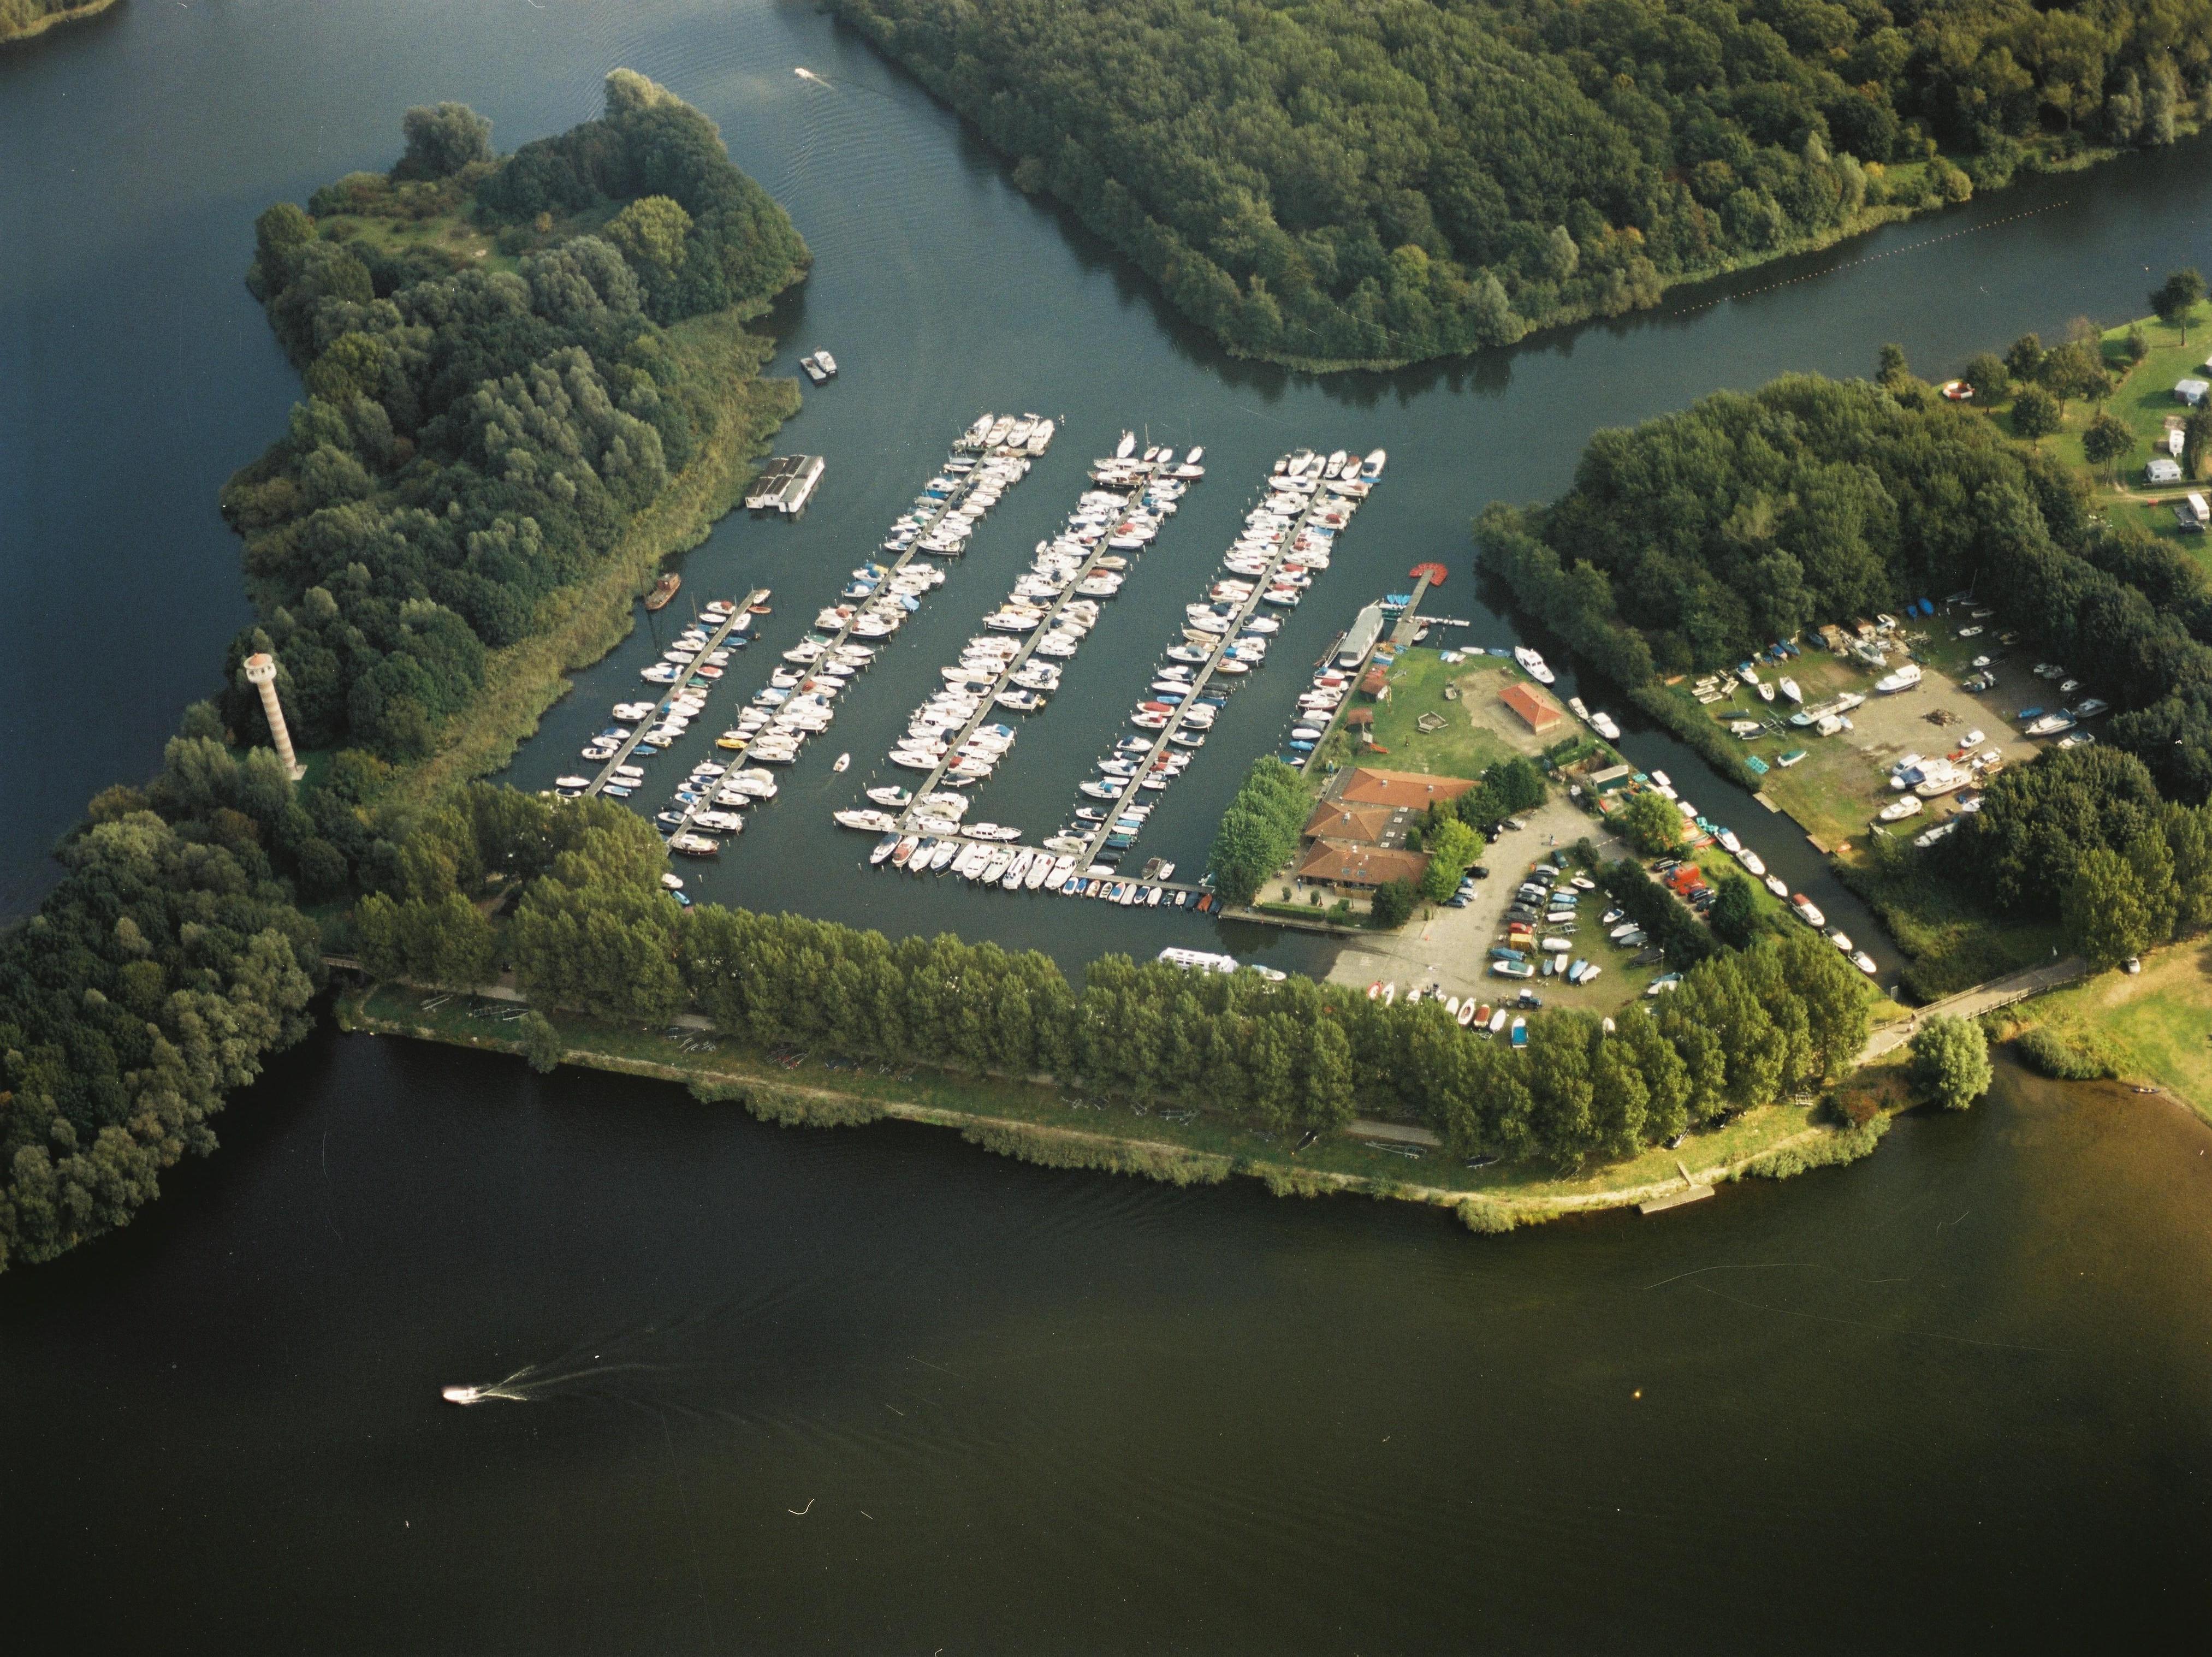 almere 2022 haddock